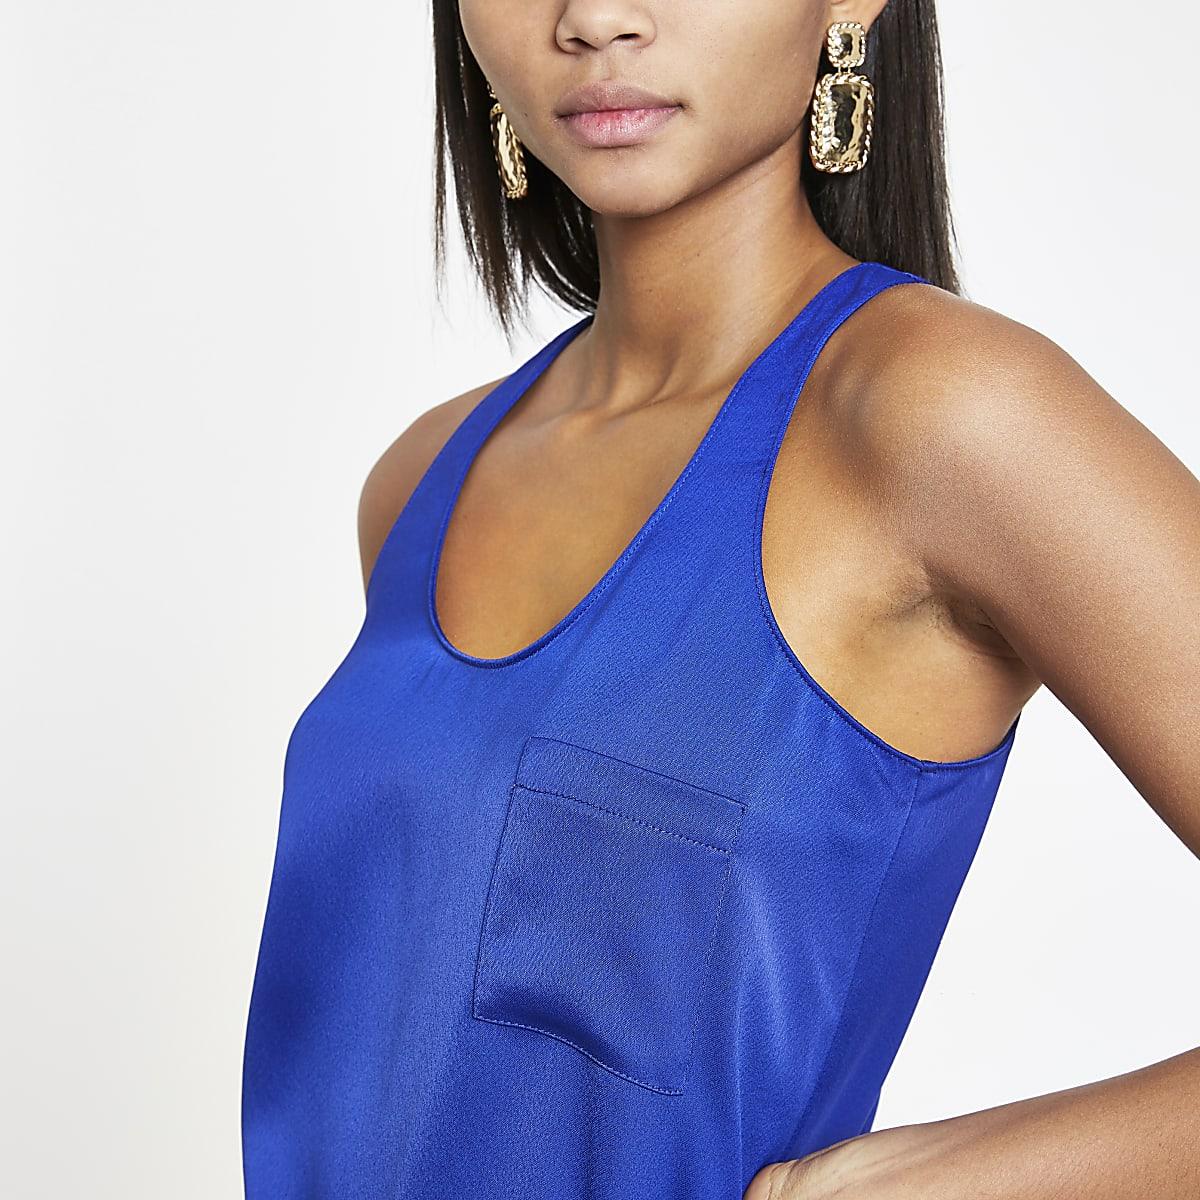 Bright blue chest pocket tank top